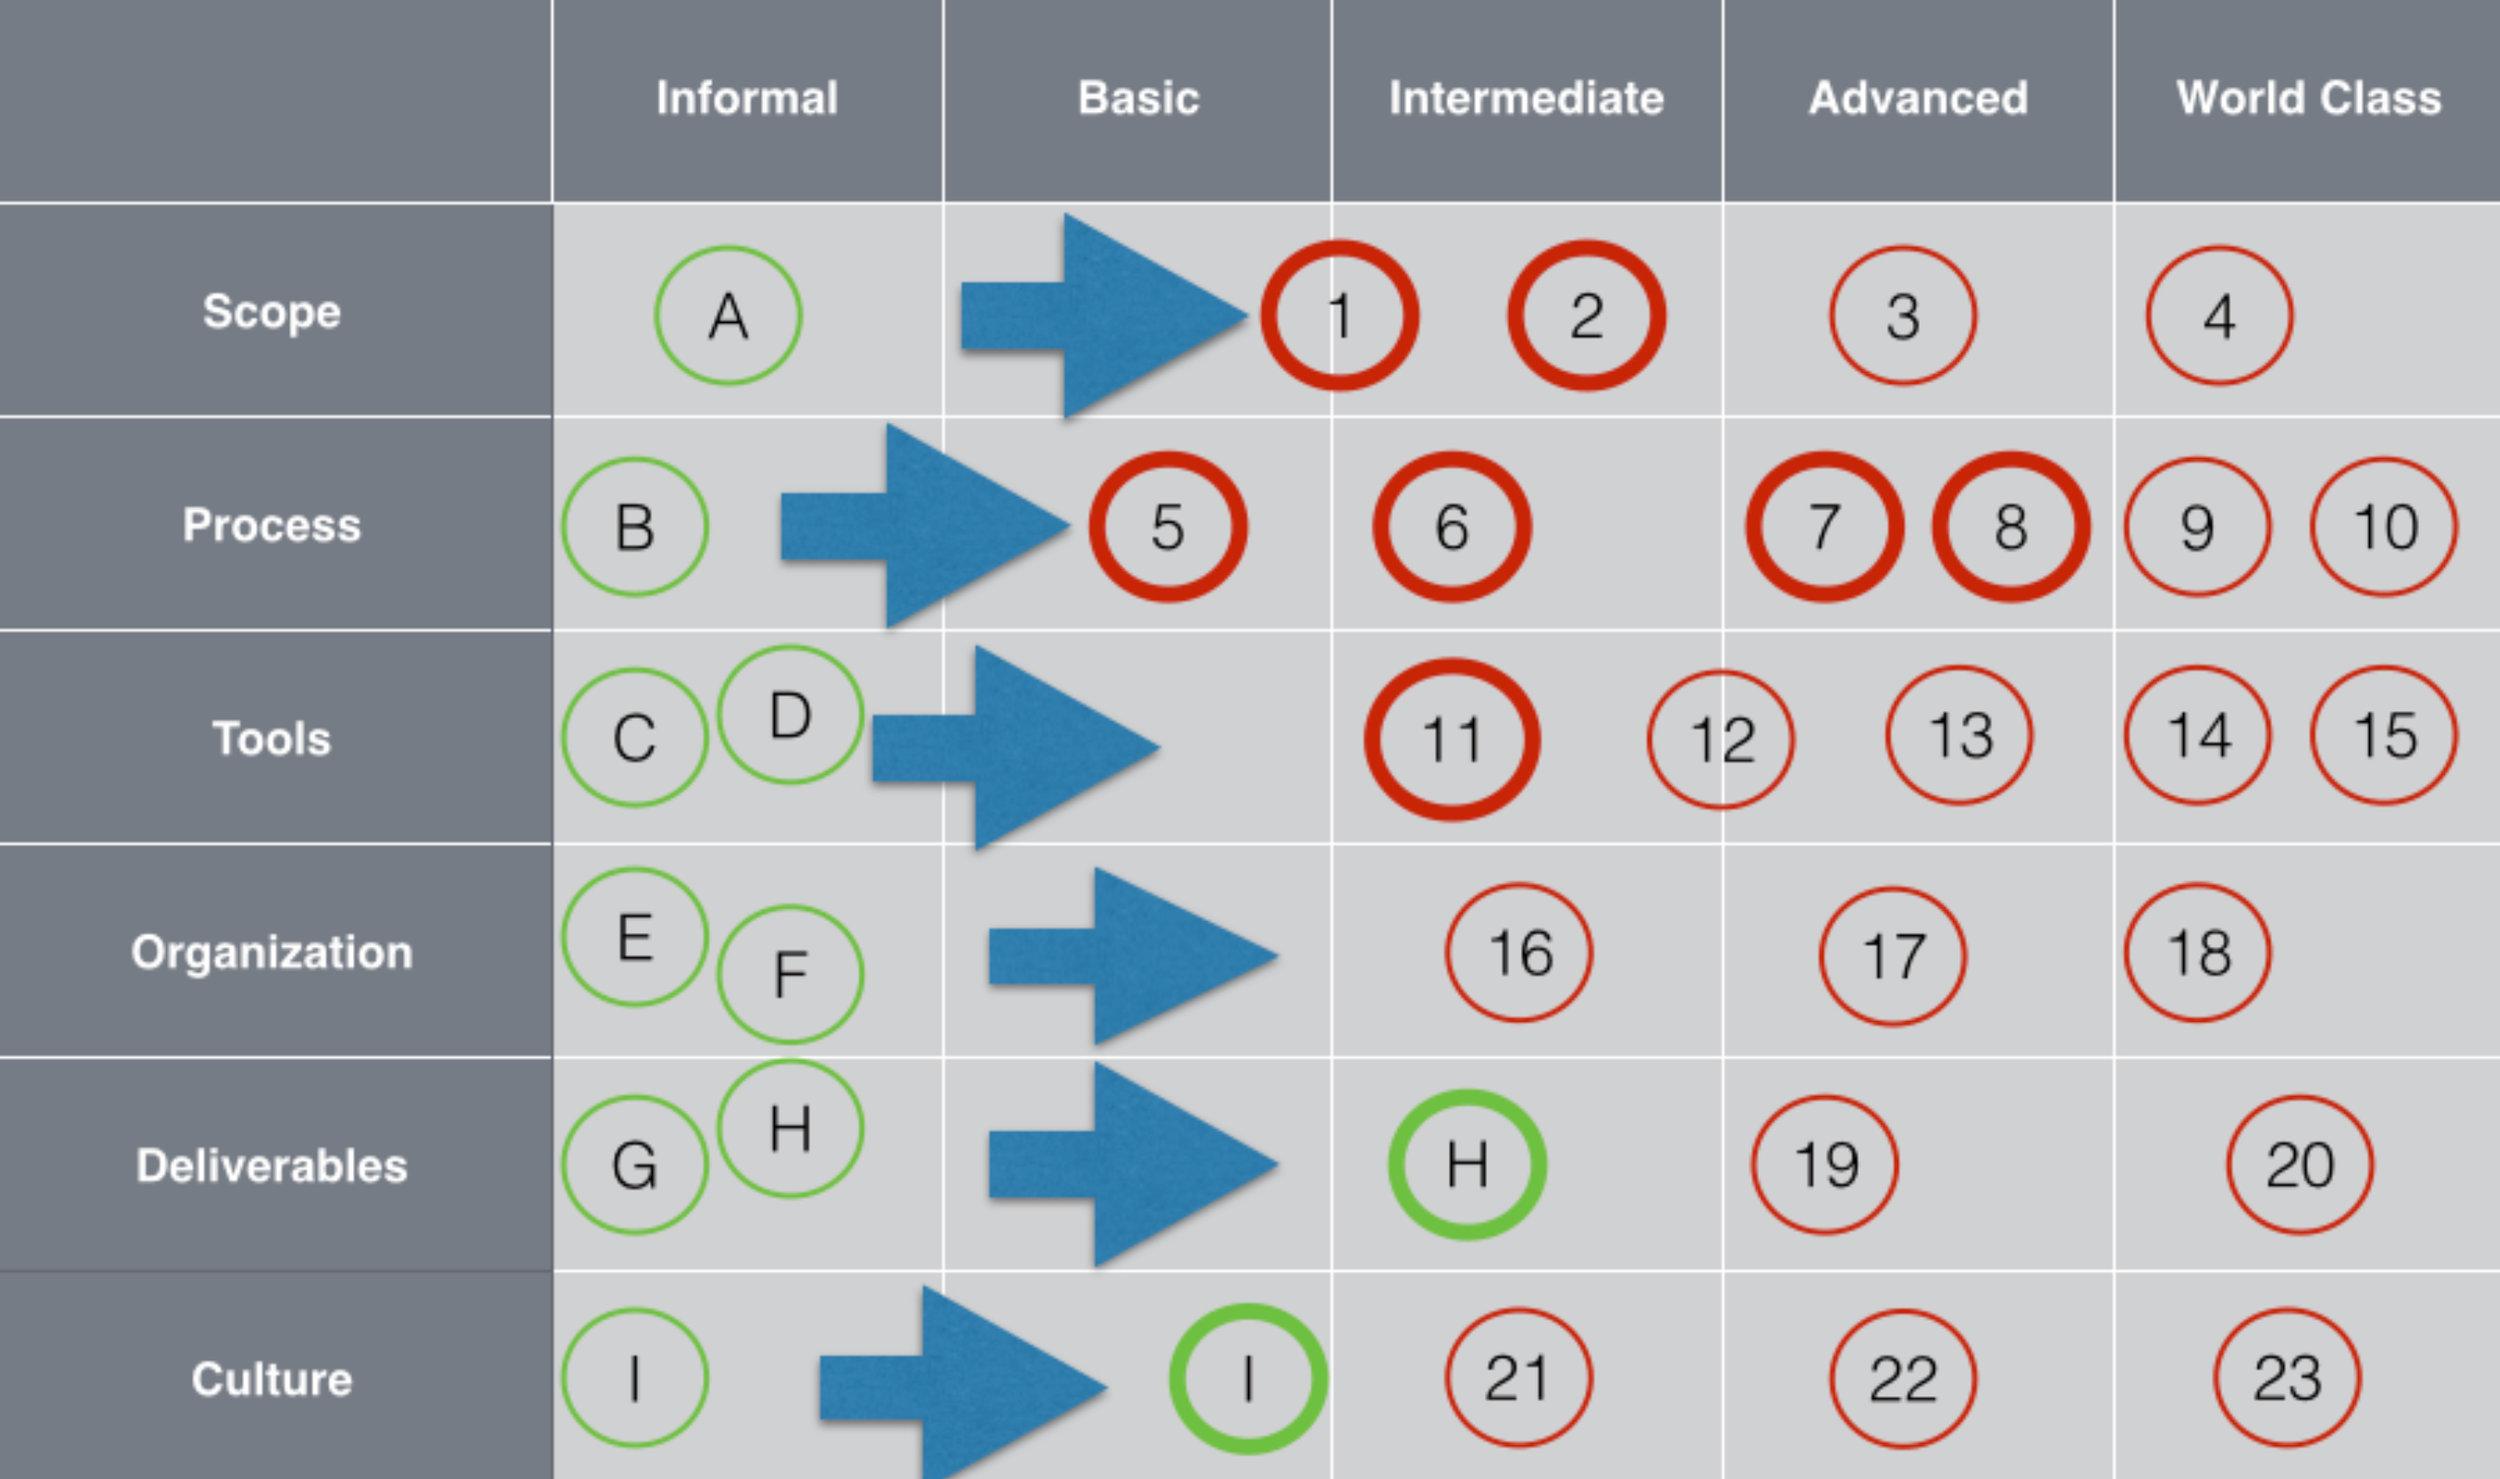 Market & Competitive Intelligence Development Roadmap with Improvement Options